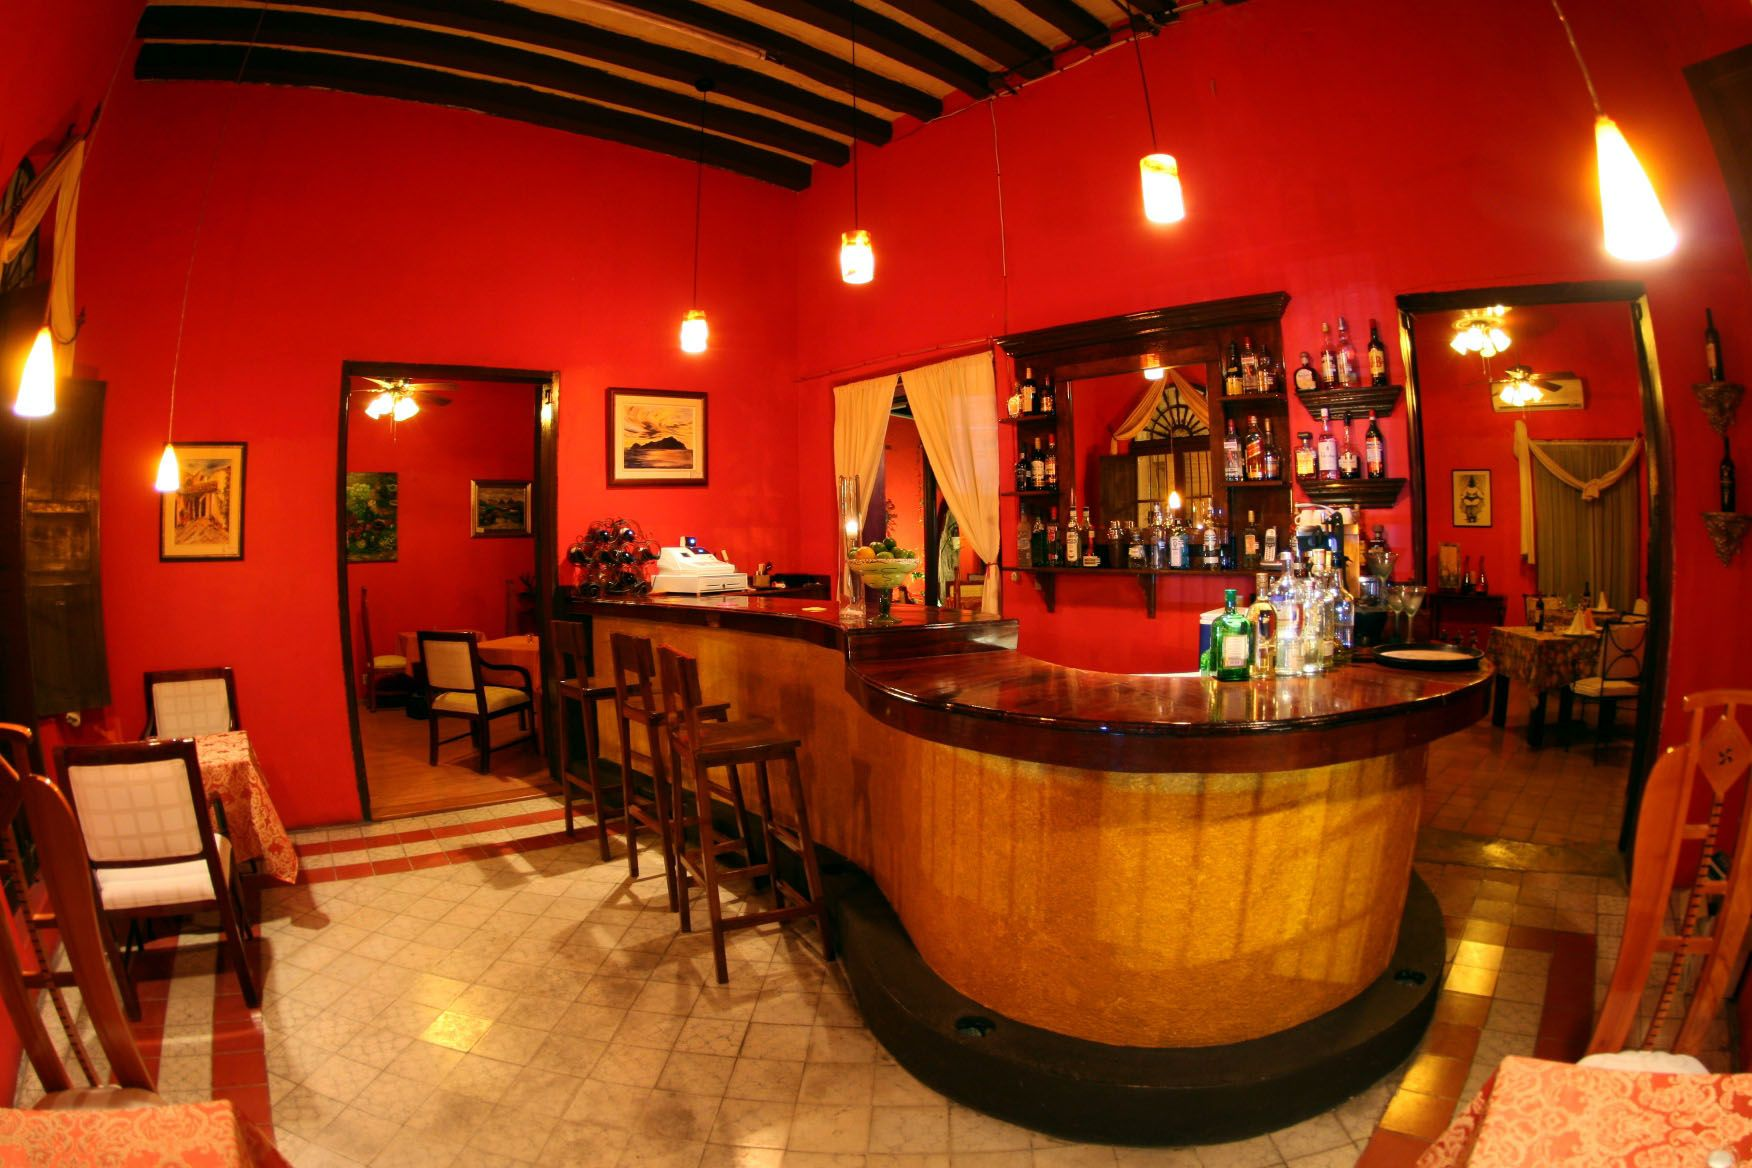 red tile floor trim | my favorites. | pinterest | restaurant, the